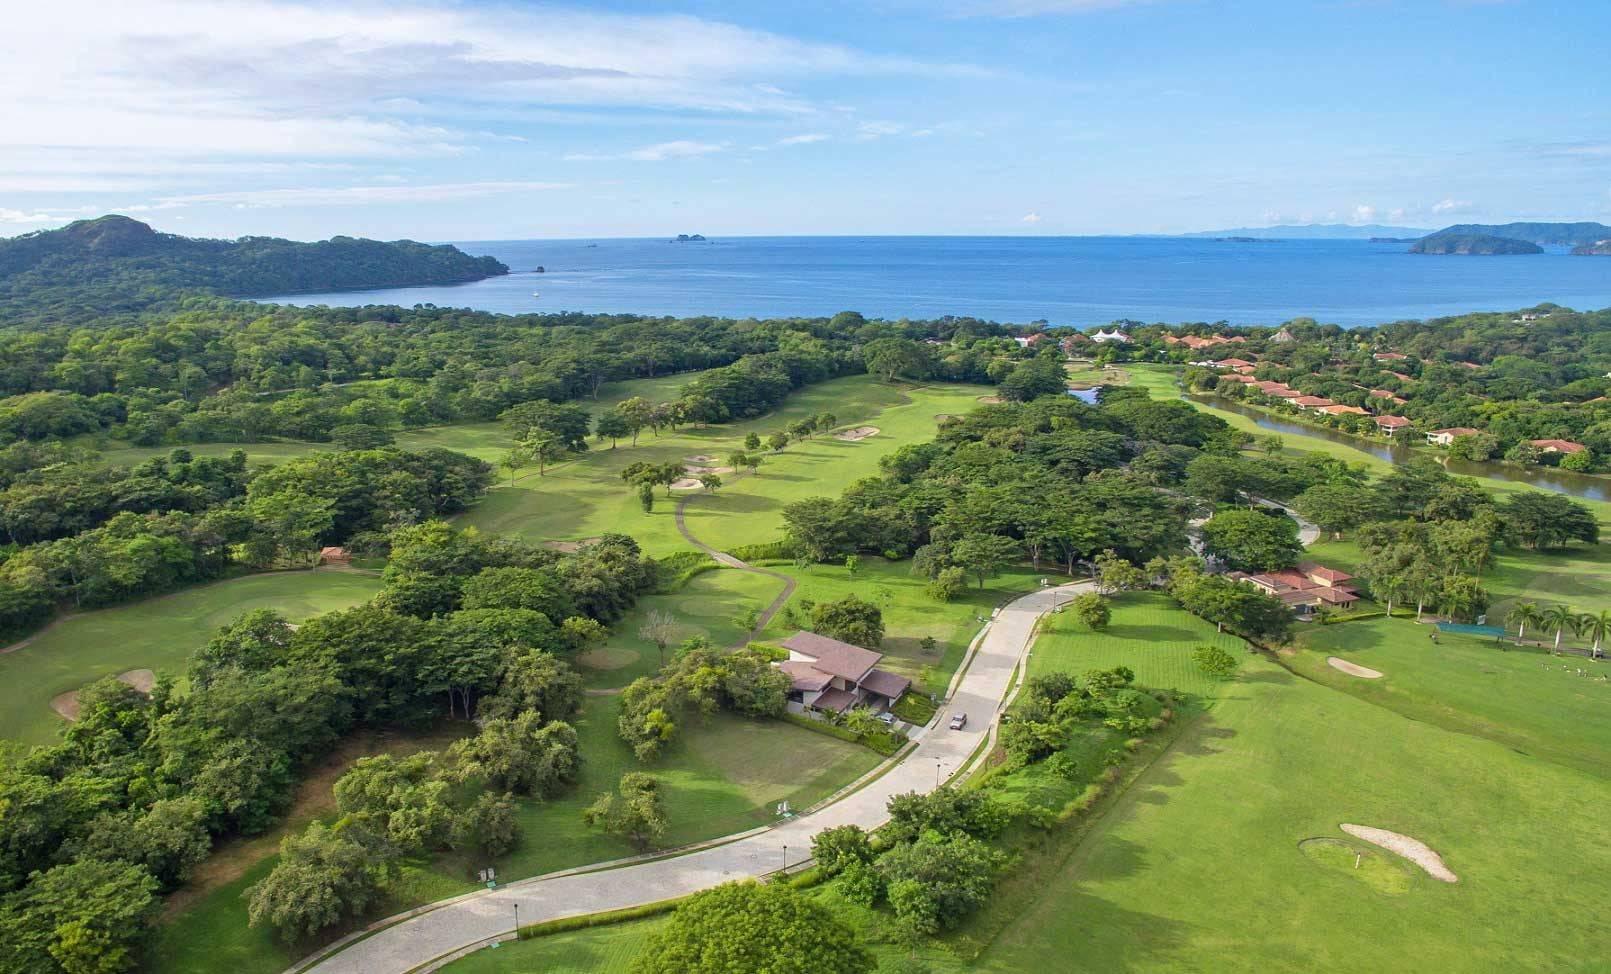 Single Family Home Sites in Beach & Golf Resort Community